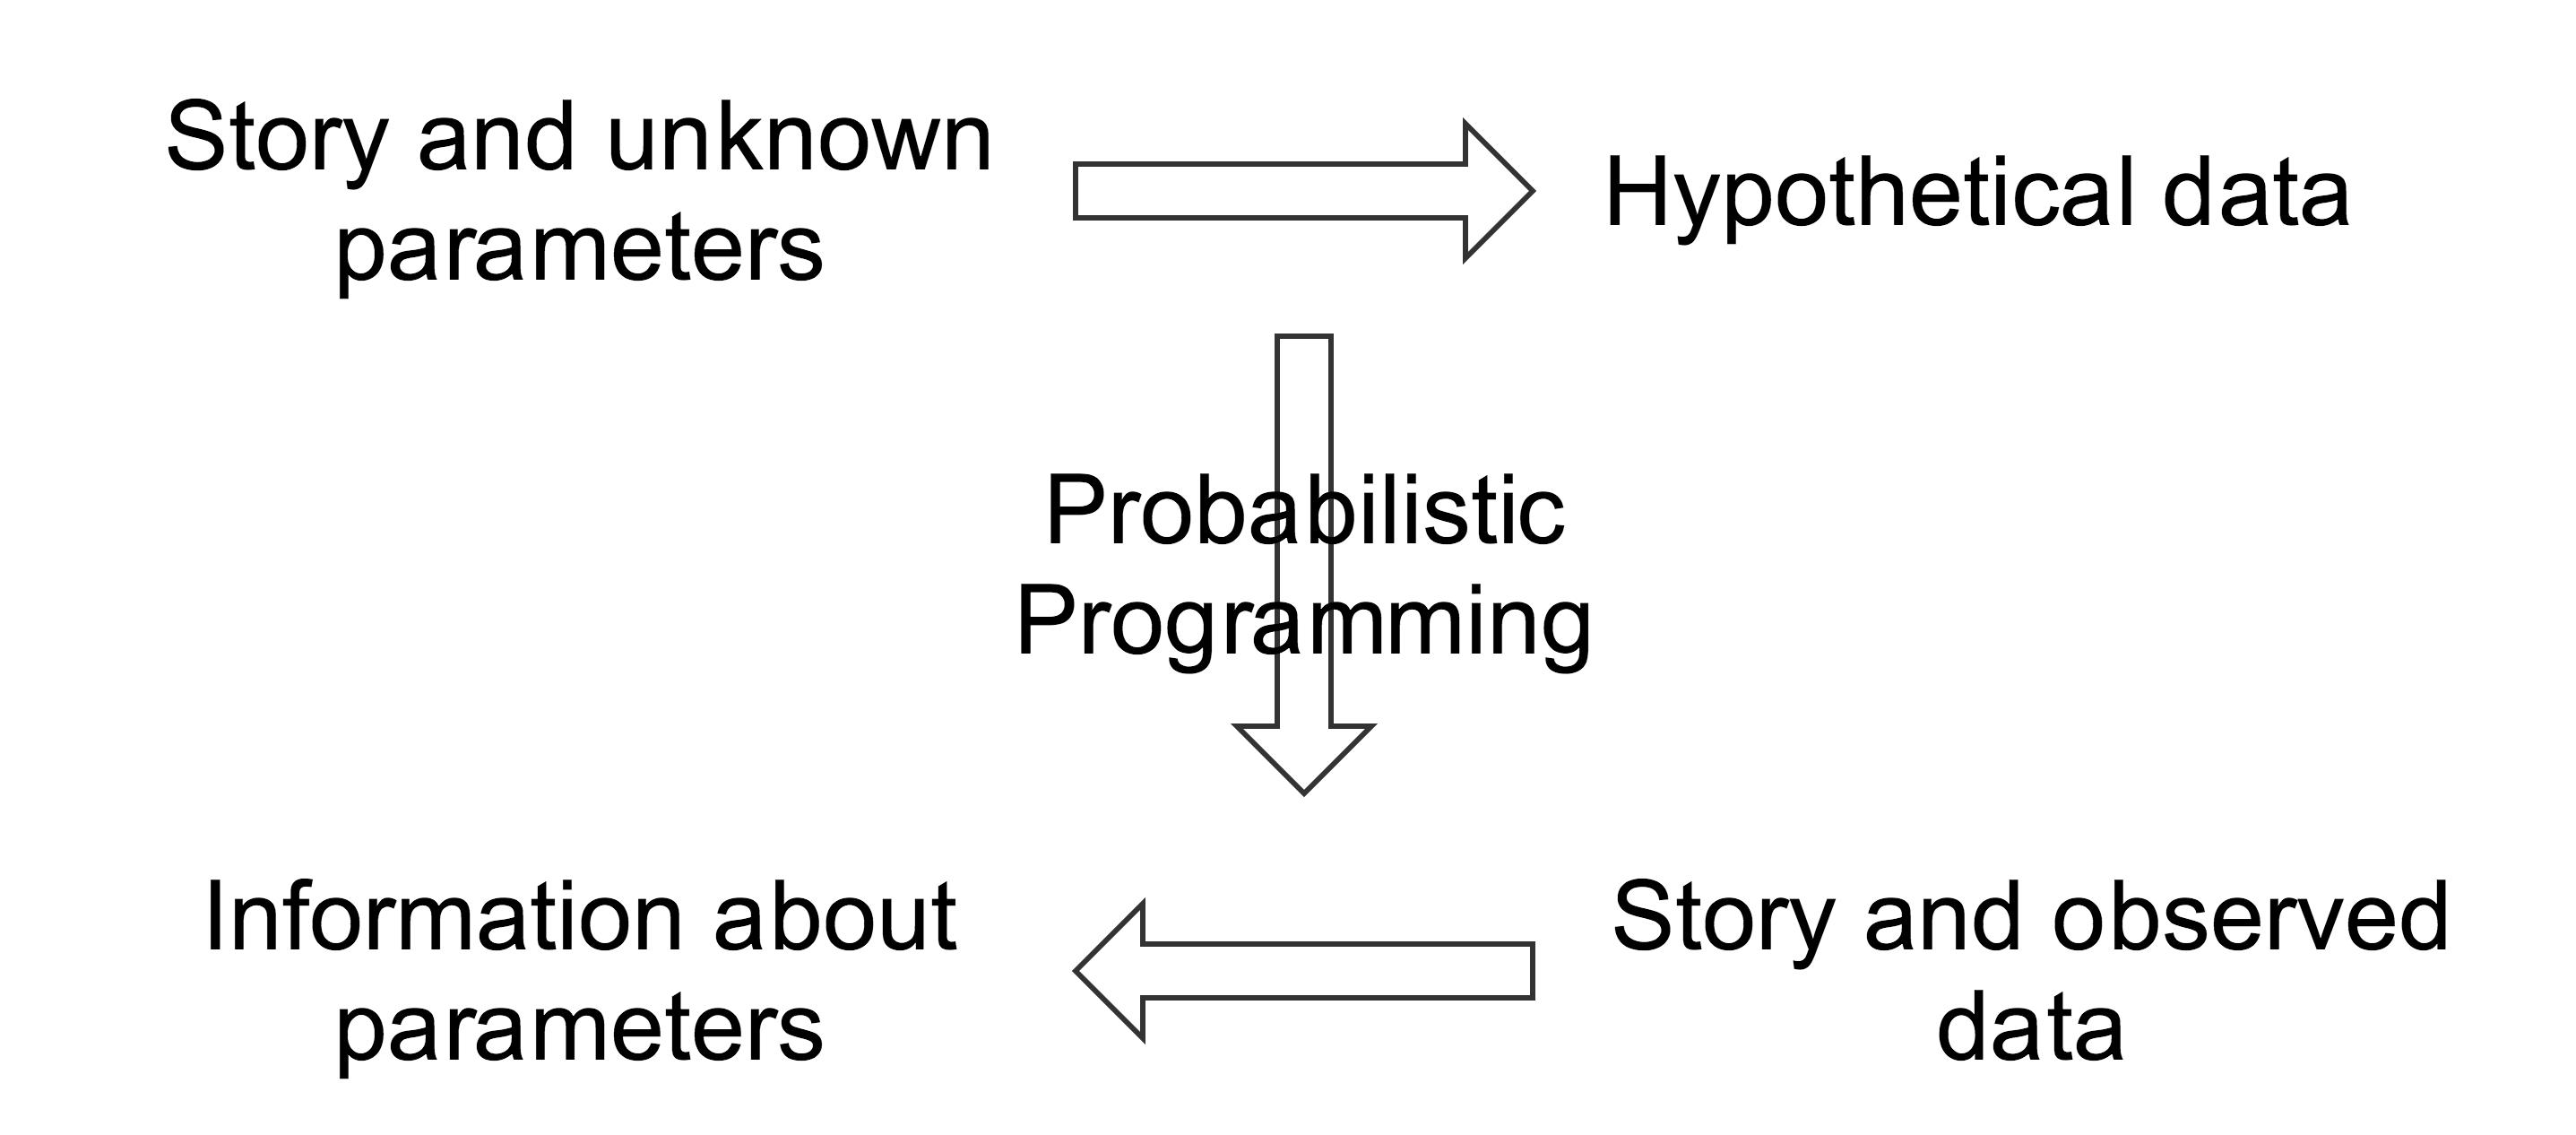 probabilistic-programming/PyMC/PyMC3-Monty-Hall--Rochford